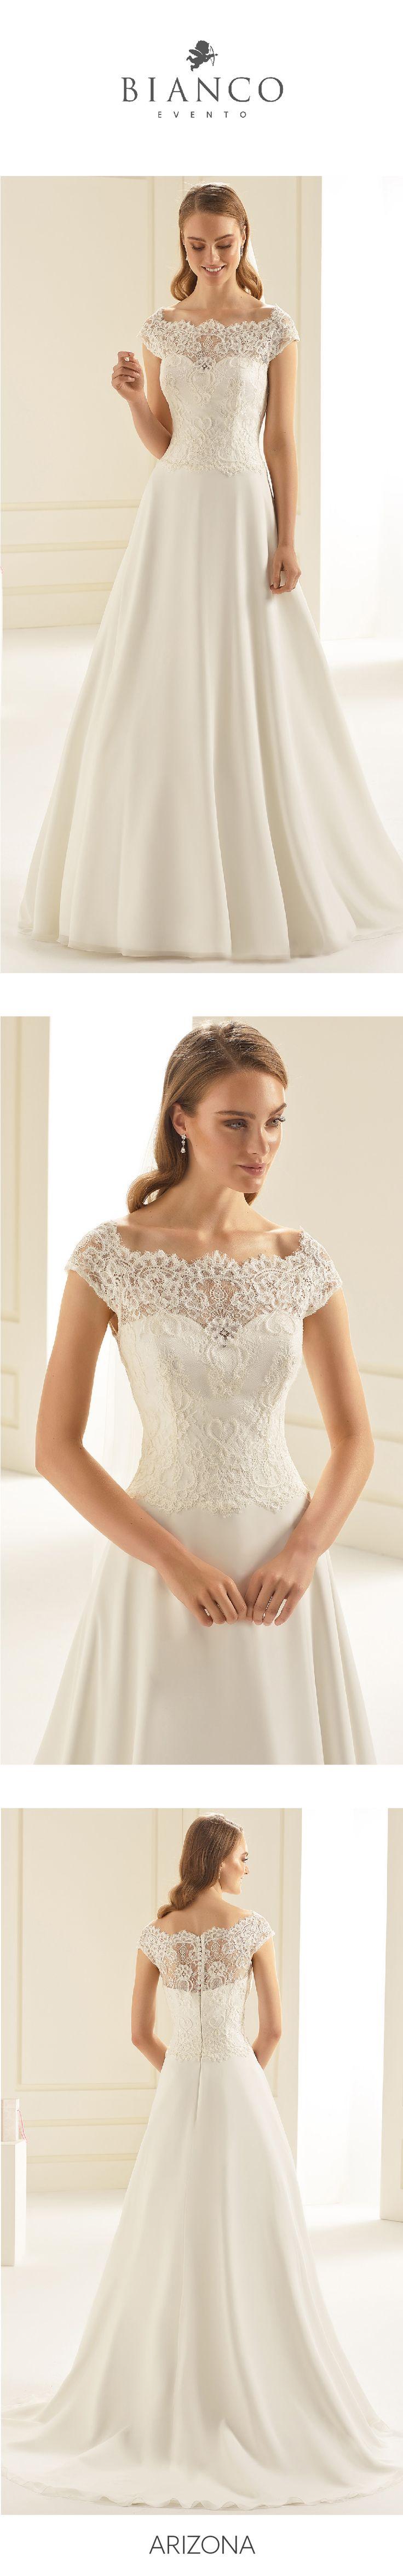 Feminine styles ready to discover! #NewCollection2018 at www.bianco-evento.com #biancoevento #biancoevento2018 #weddingdress #bridetobe